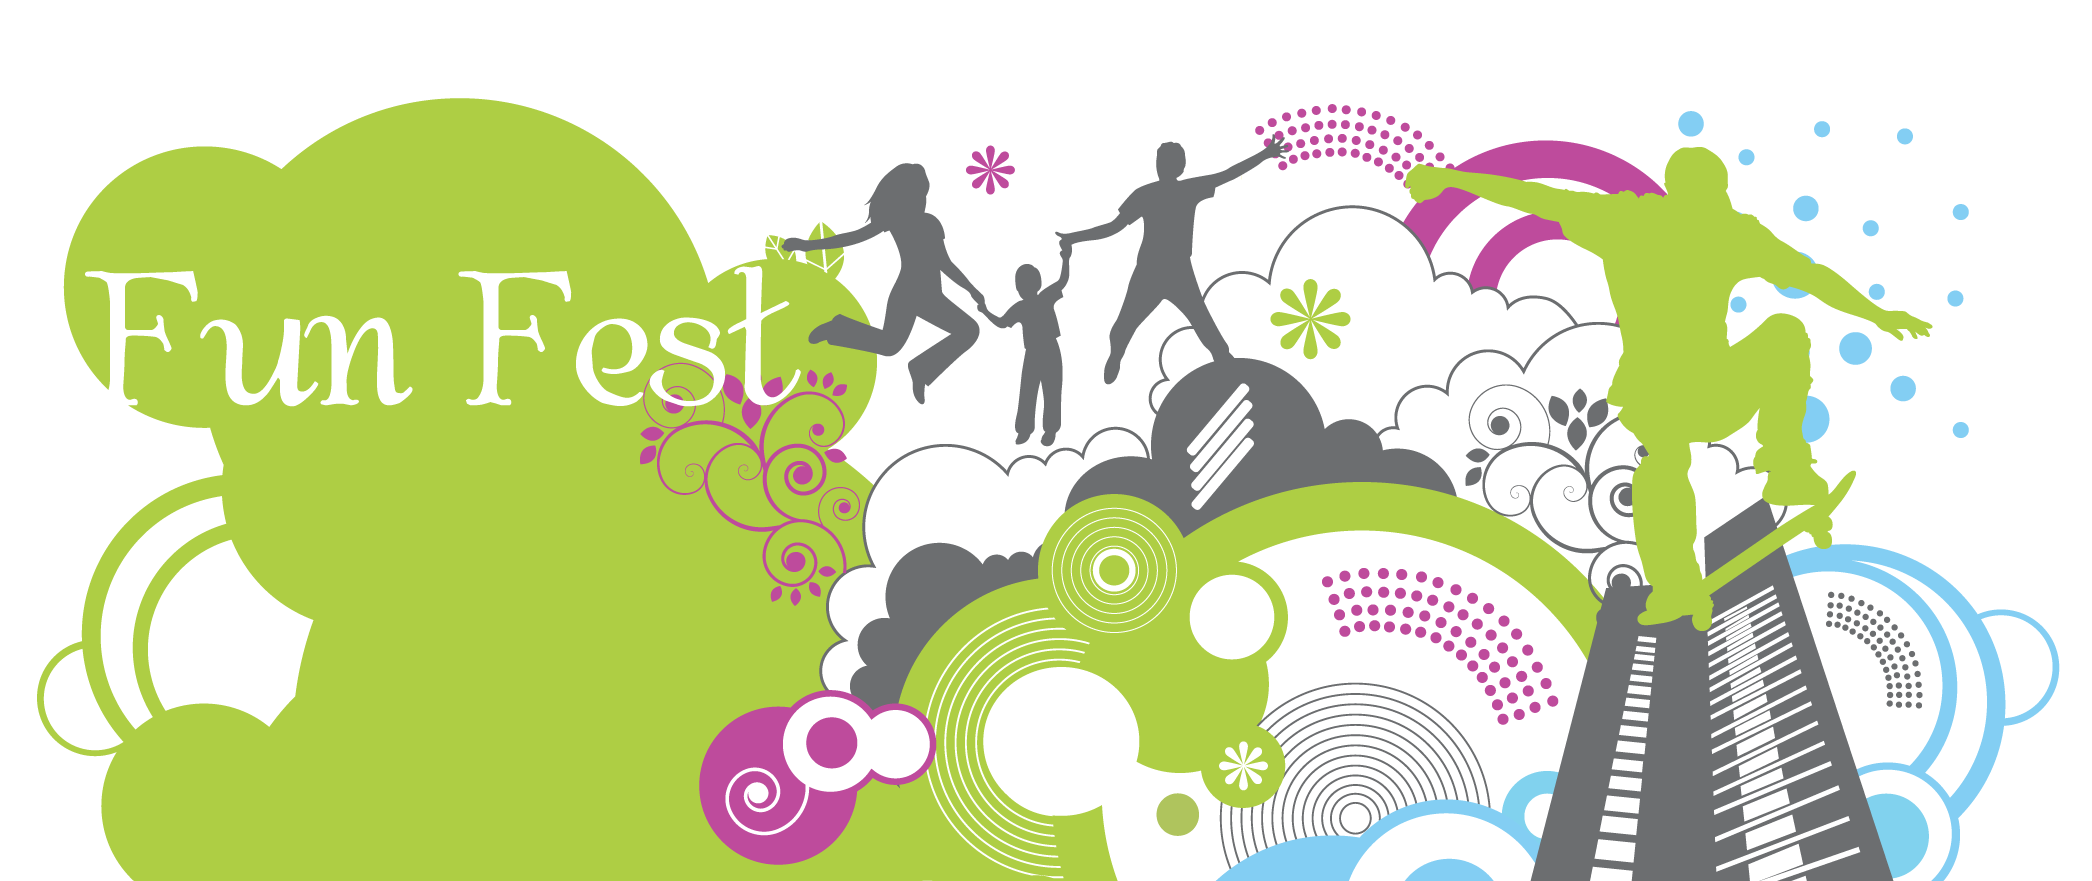 Fun-Fest-1.png